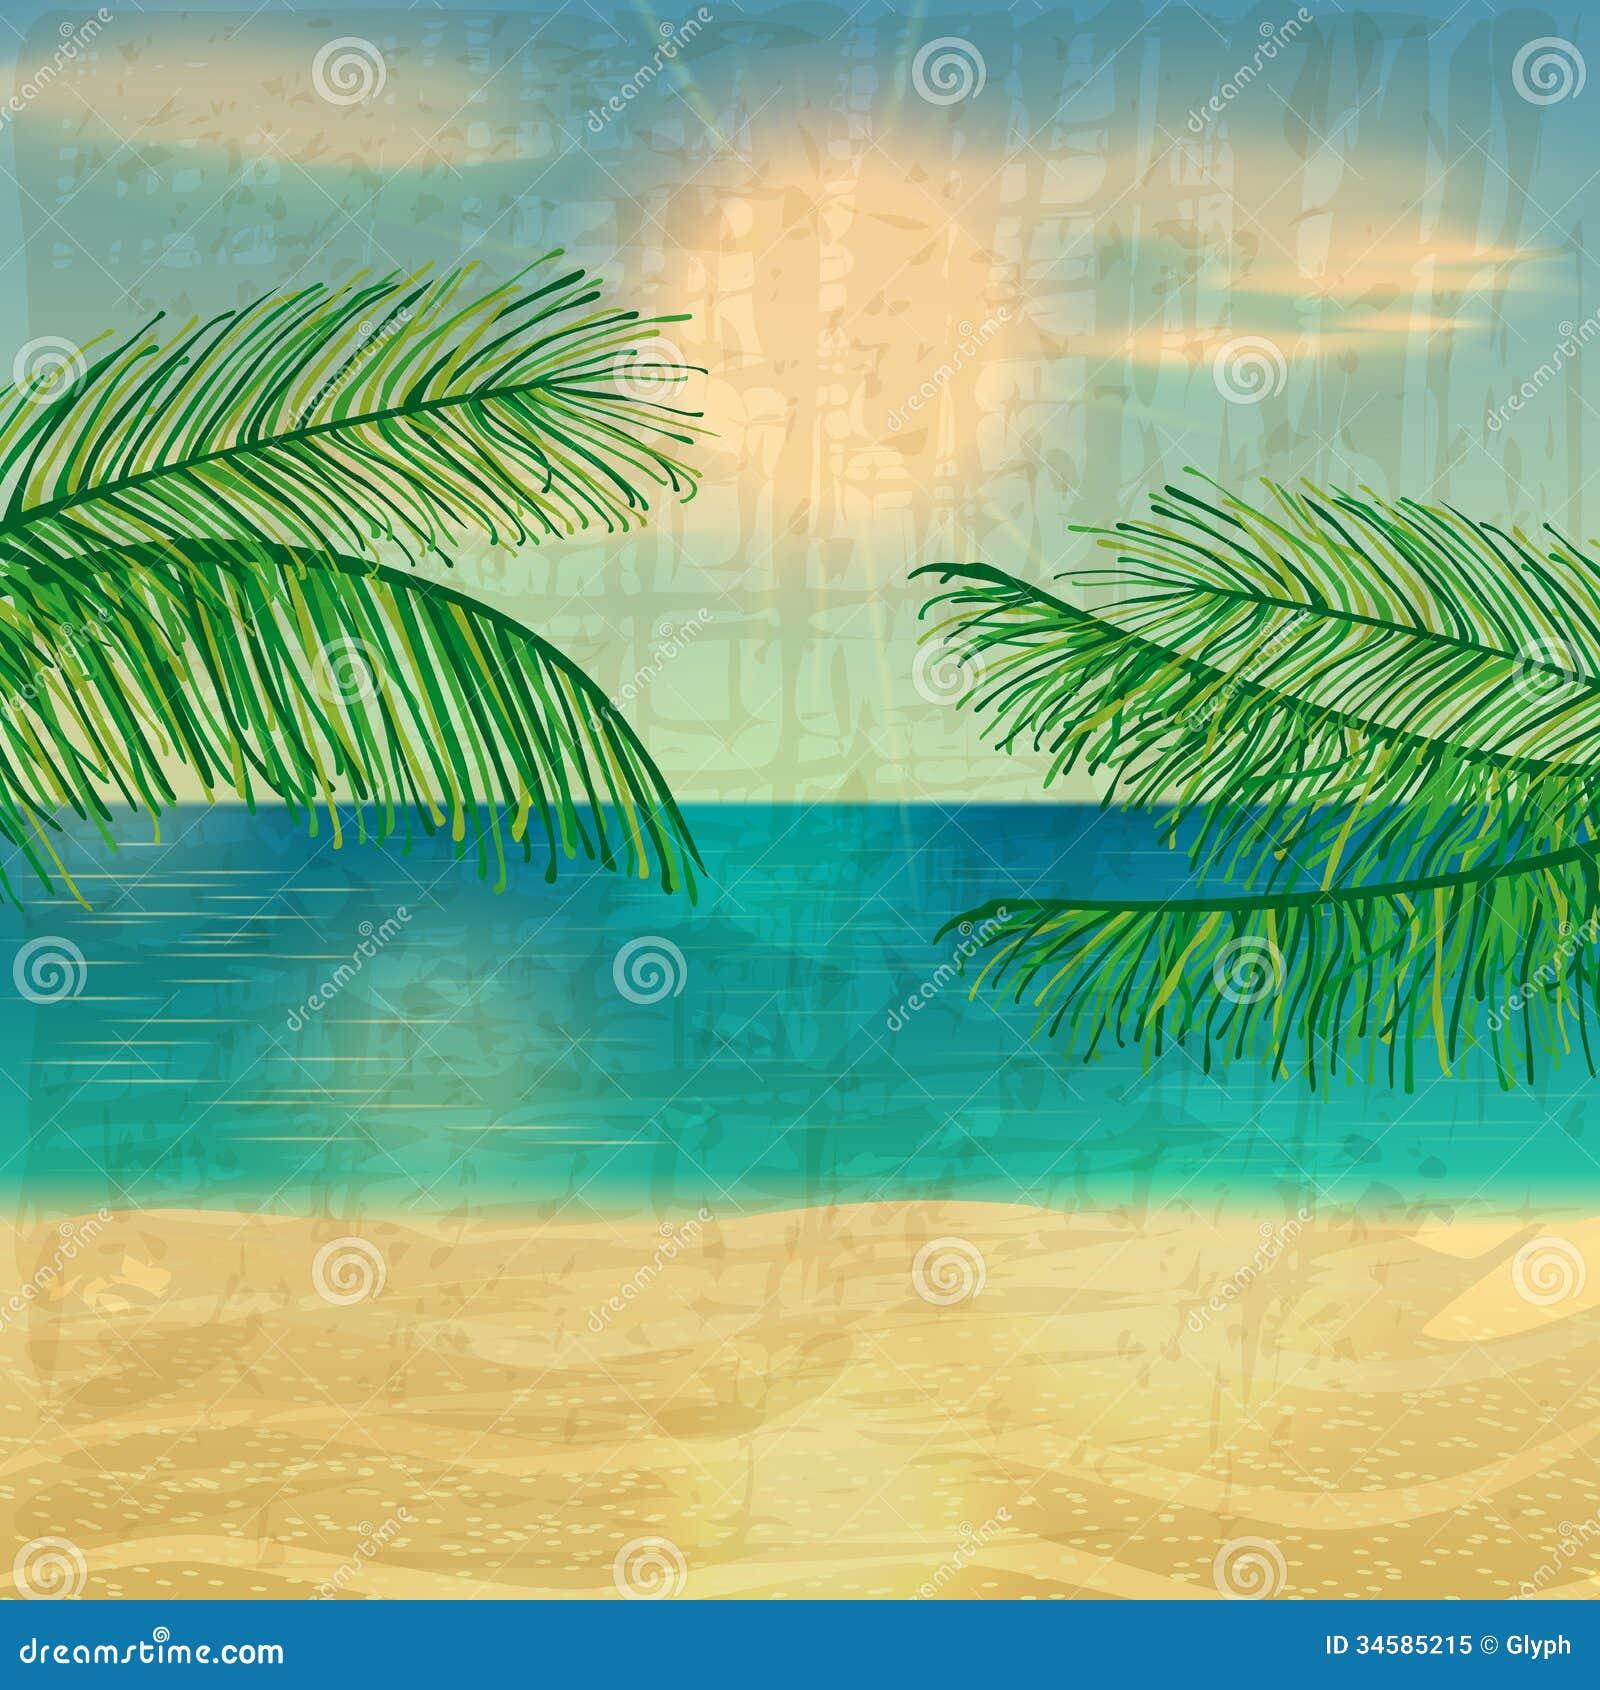 Vintage Beach Background Stock Photo 112981333: Retro Beach Illustration Royalty Free Stock Photo